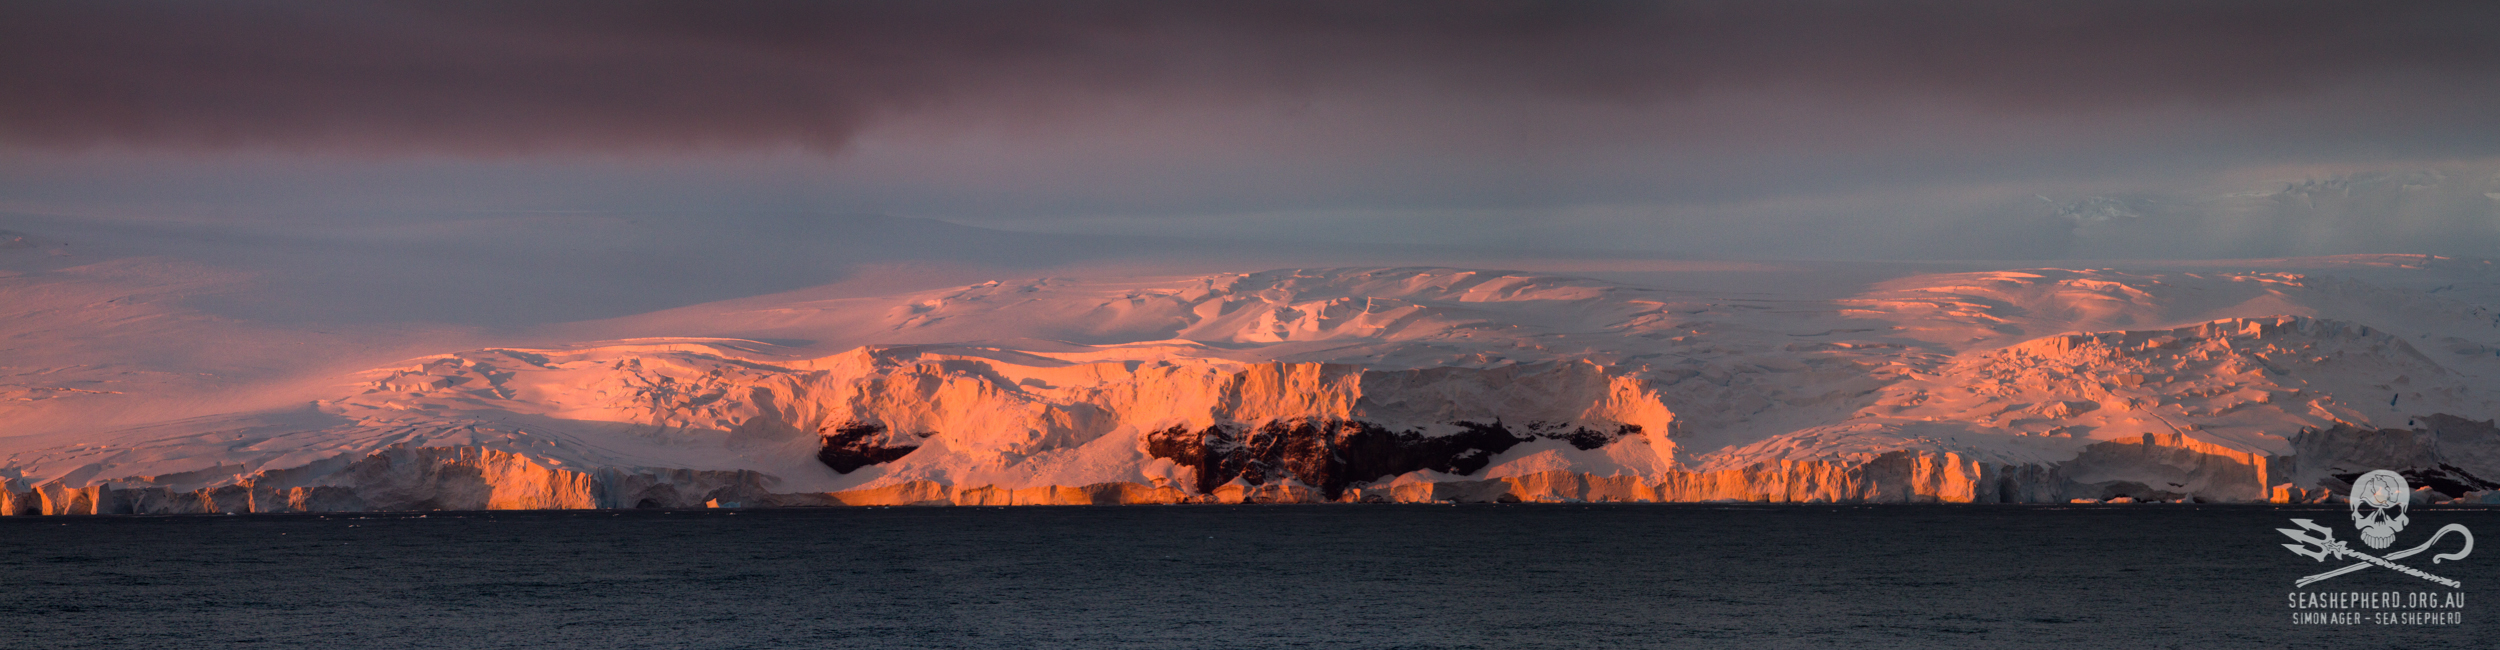 140212-SA-Balleny-Islands-at-sunrise-IMG_5821-Edit.jpg